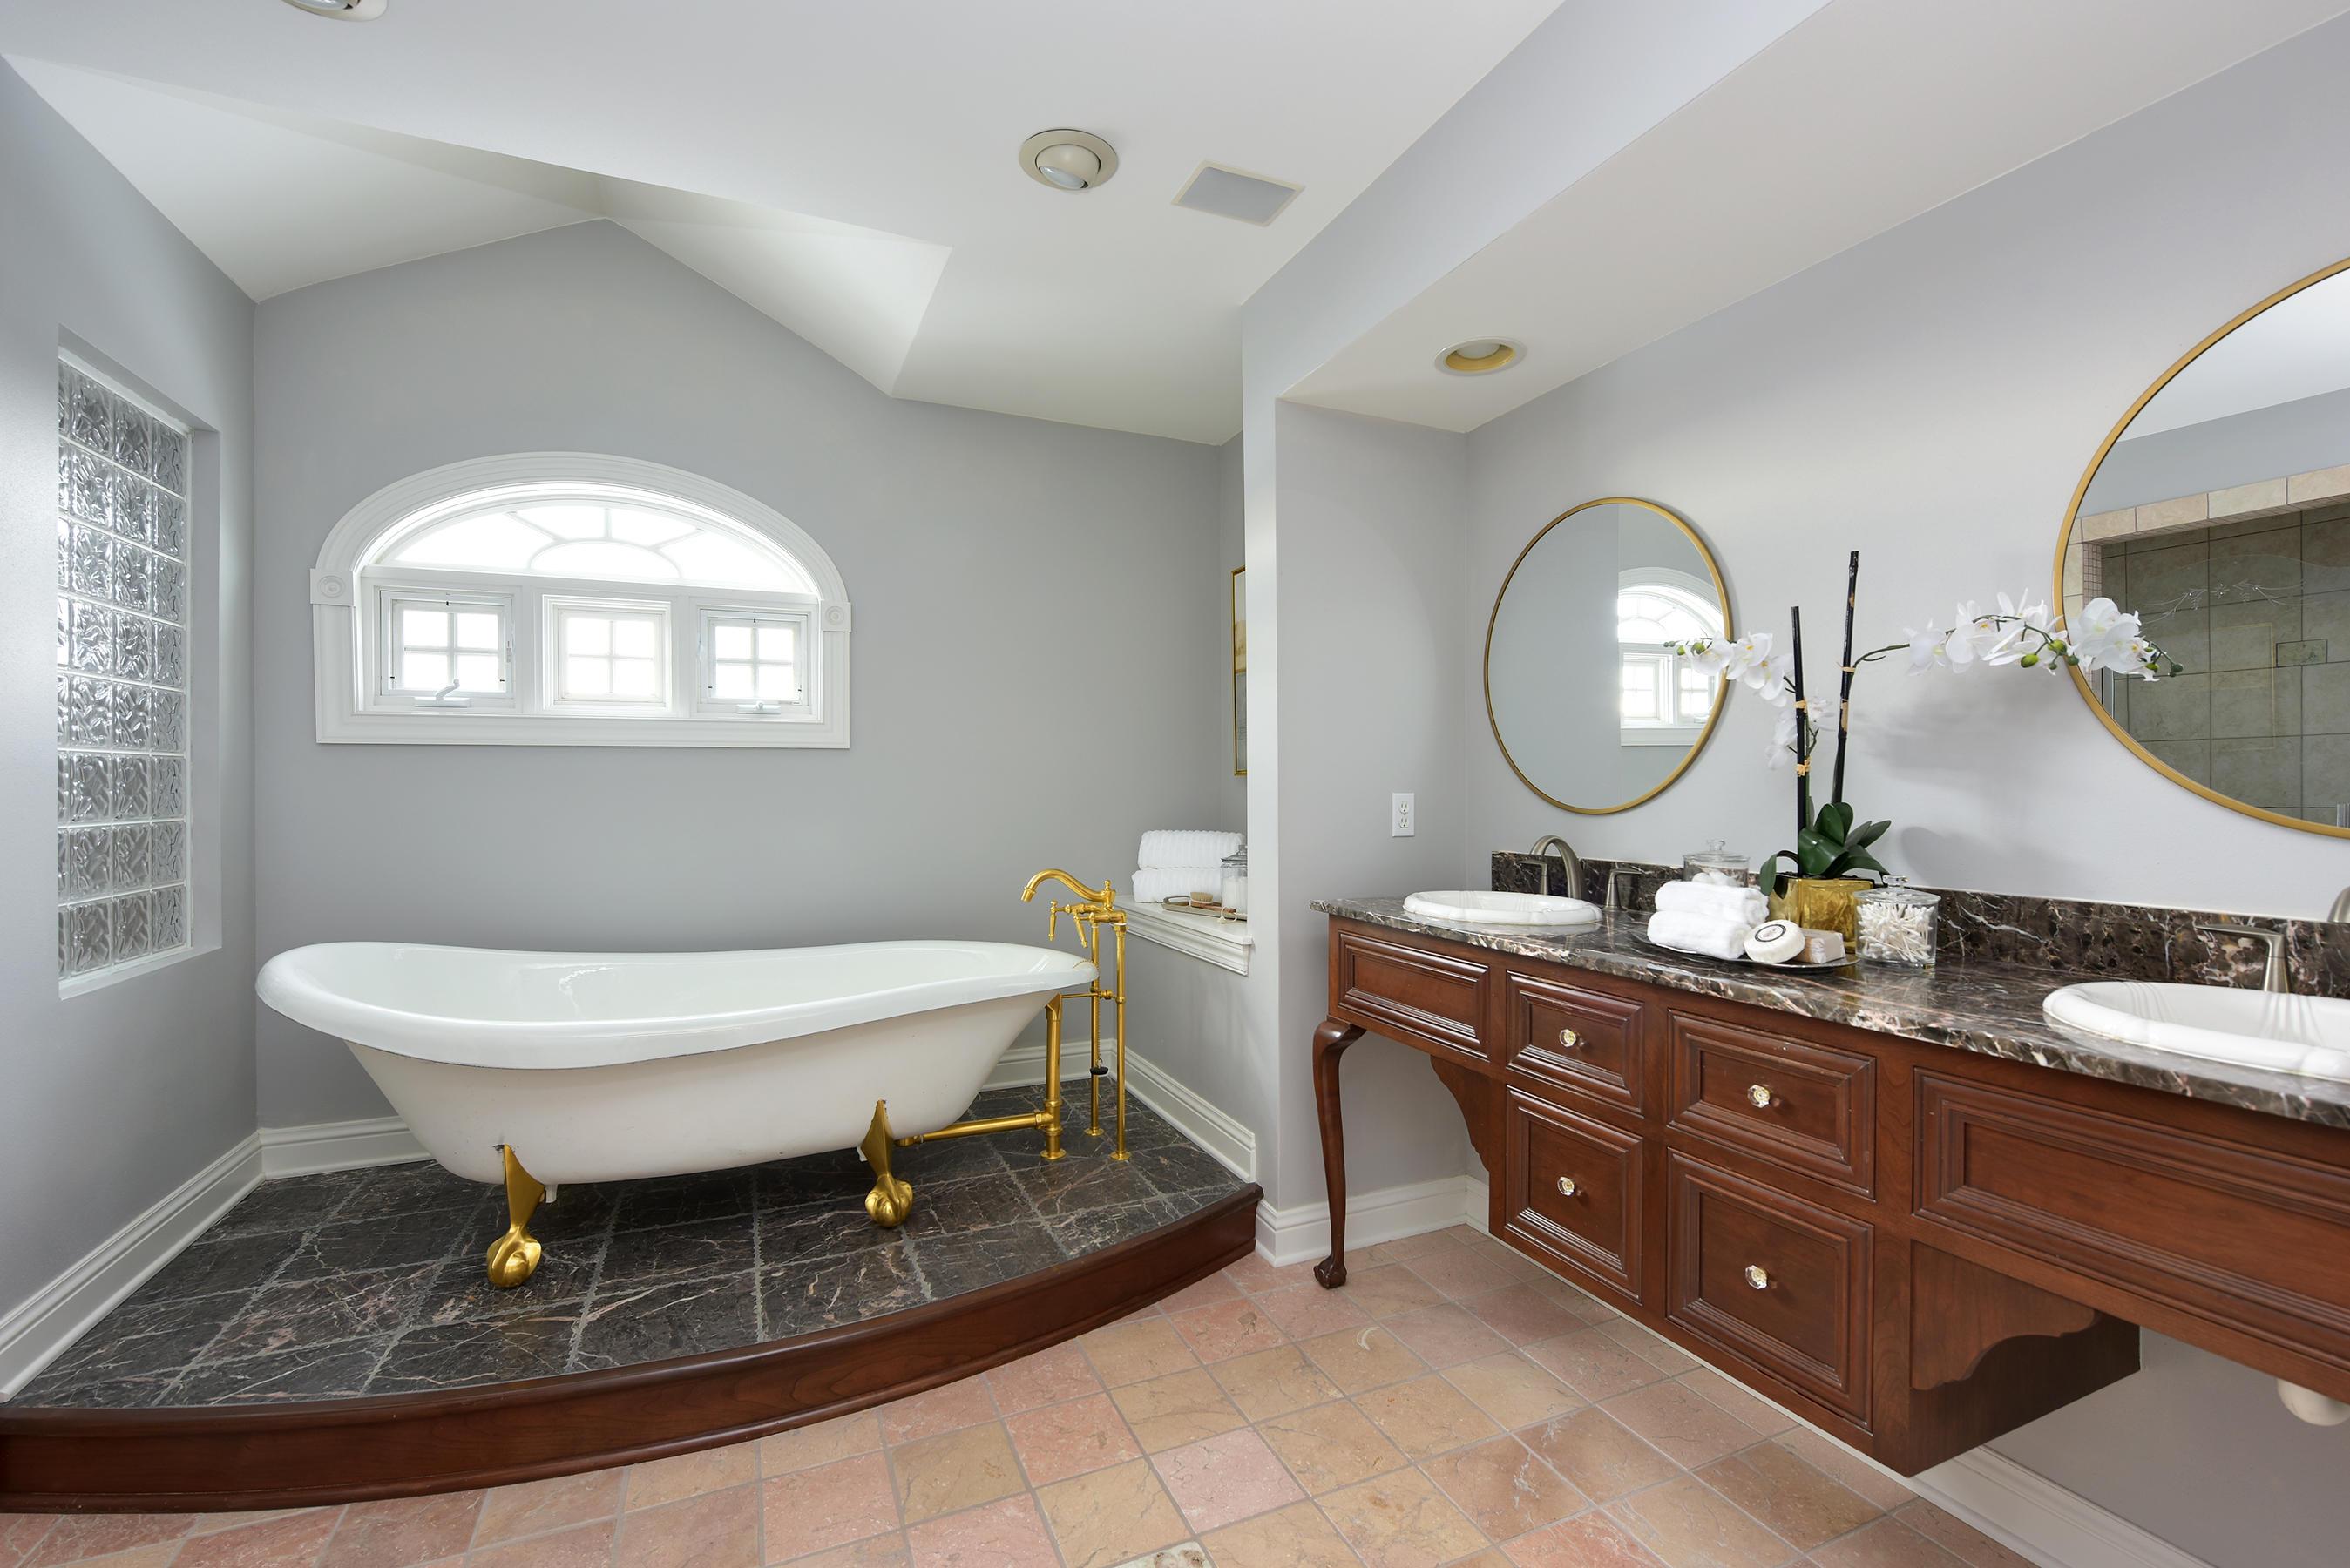 1903 Bristlecone Dr, Hartland, Wisconsin 53029, 4 Bedrooms Bedrooms, 14 Rooms Rooms,4 BathroomsBathrooms,Single-Family,For Sale,Bristlecone Dr,1619247